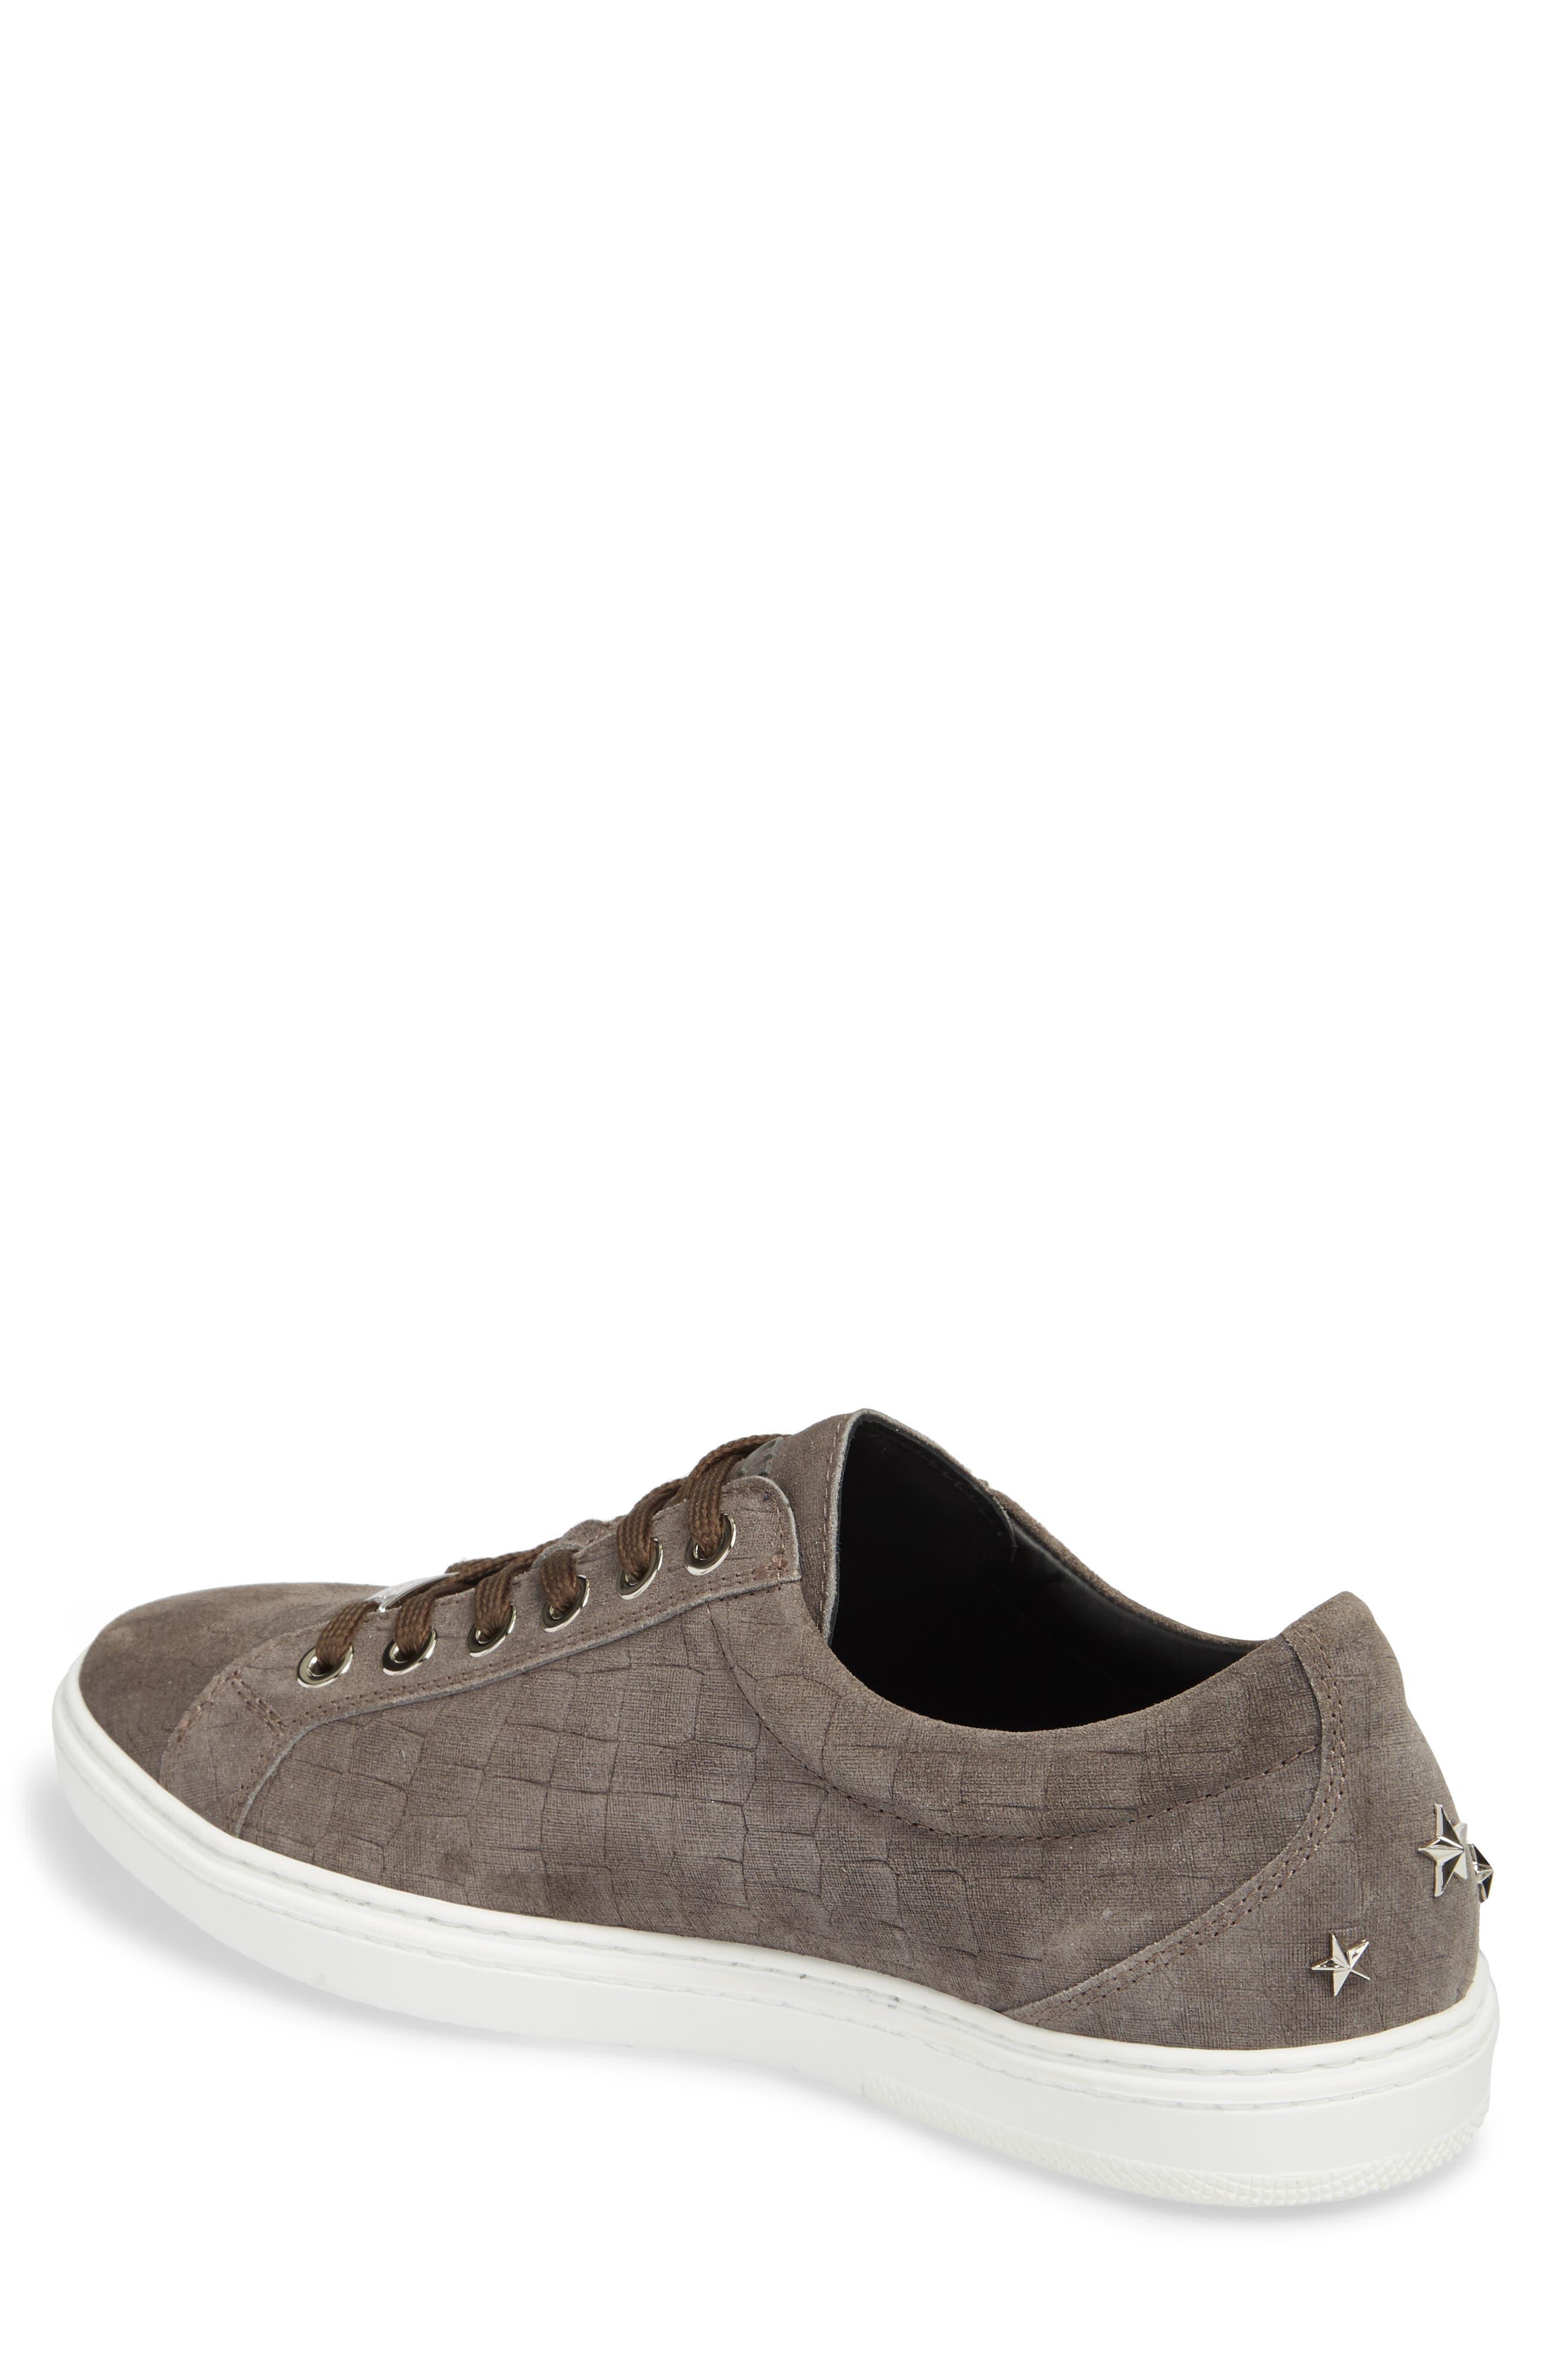 Cash Sneaker,                             Alternate thumbnail 2, color,                             021